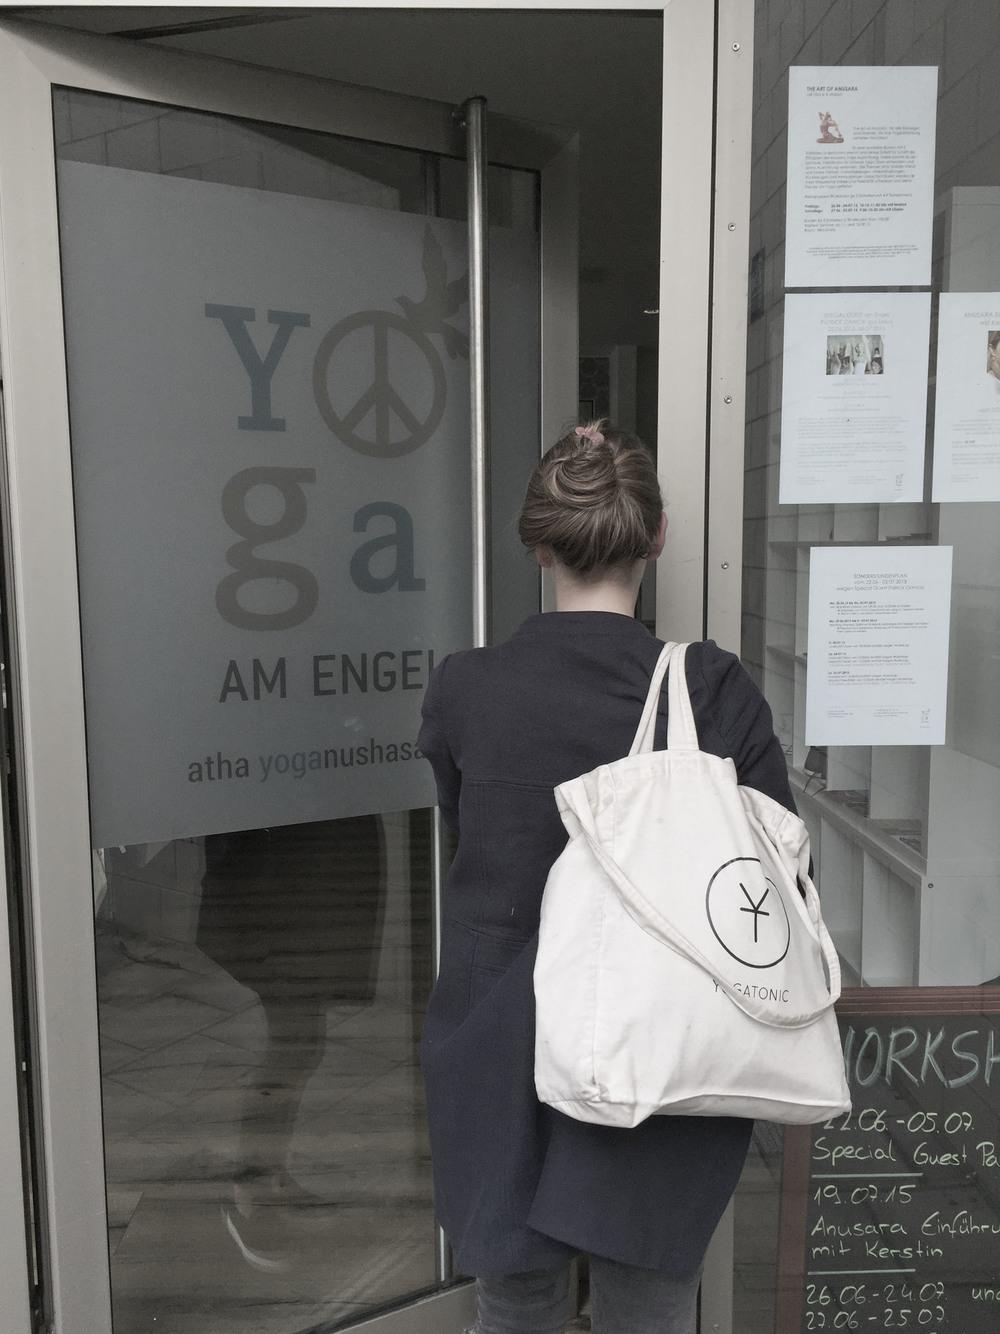 Yoga am Engel, yoga Studio, München Bogenhausen3440.jpg